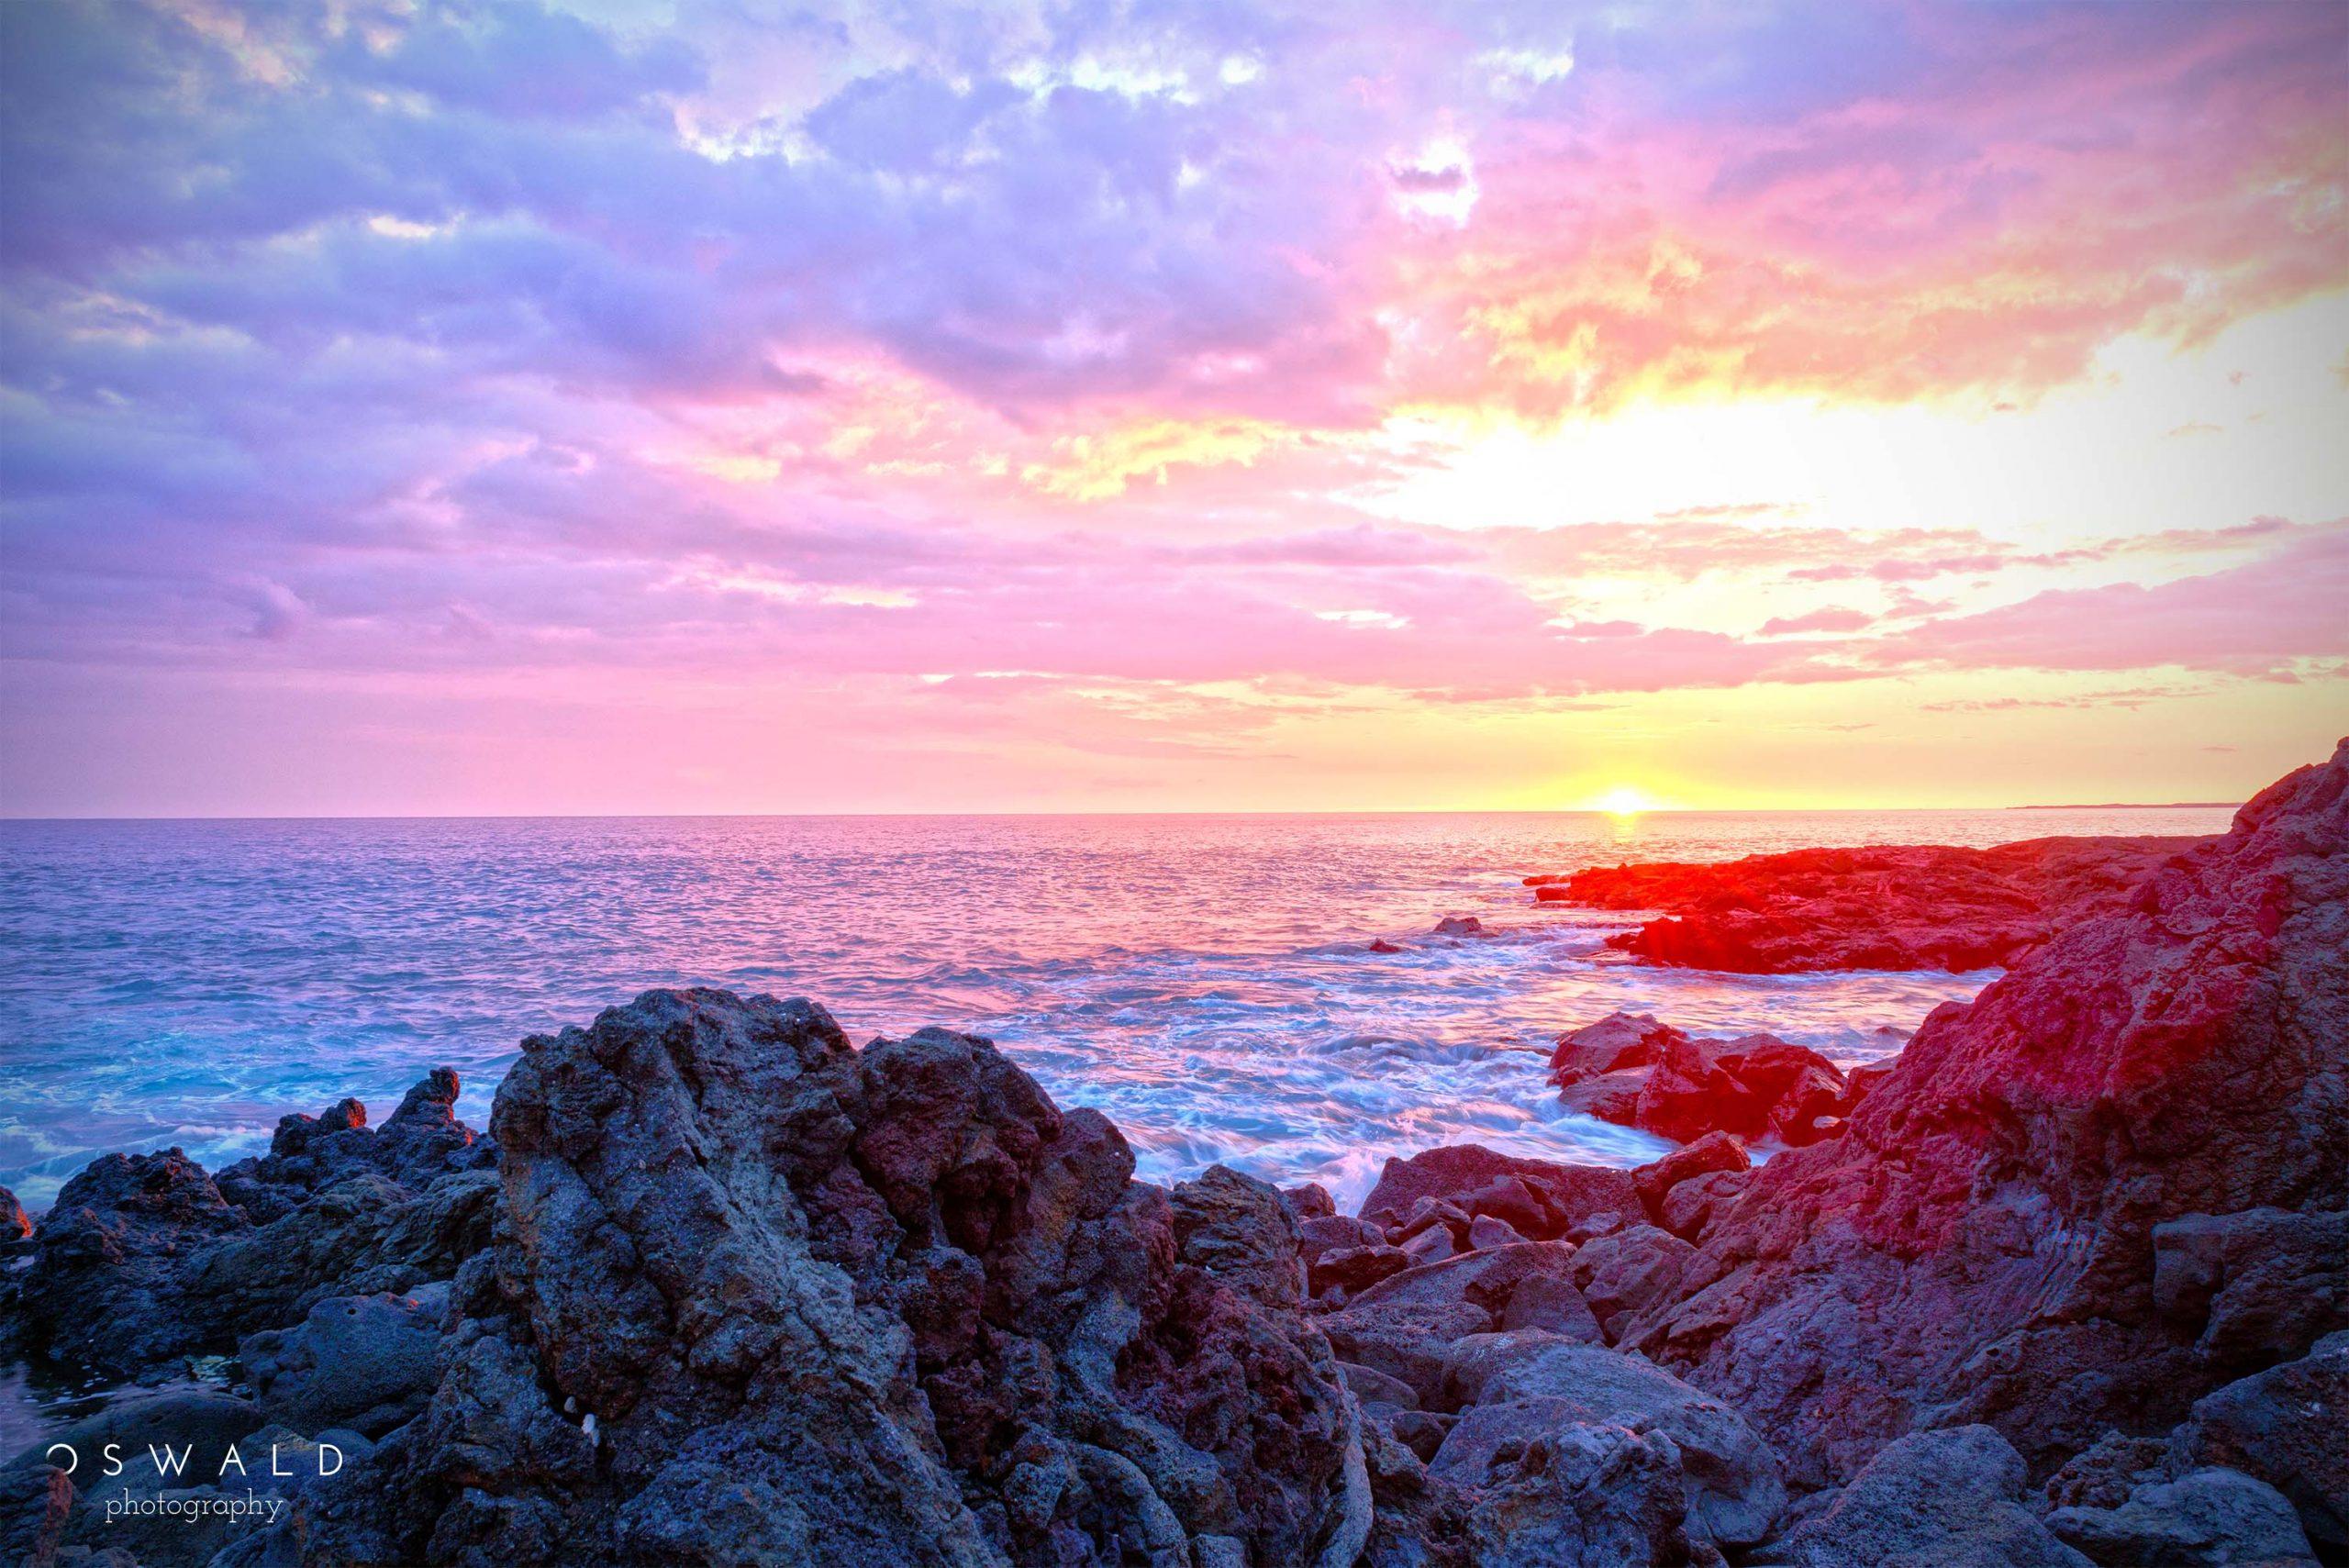 A sunset photograph of a rocky shore along the coast of Kona on the Big Island of Hawaii.